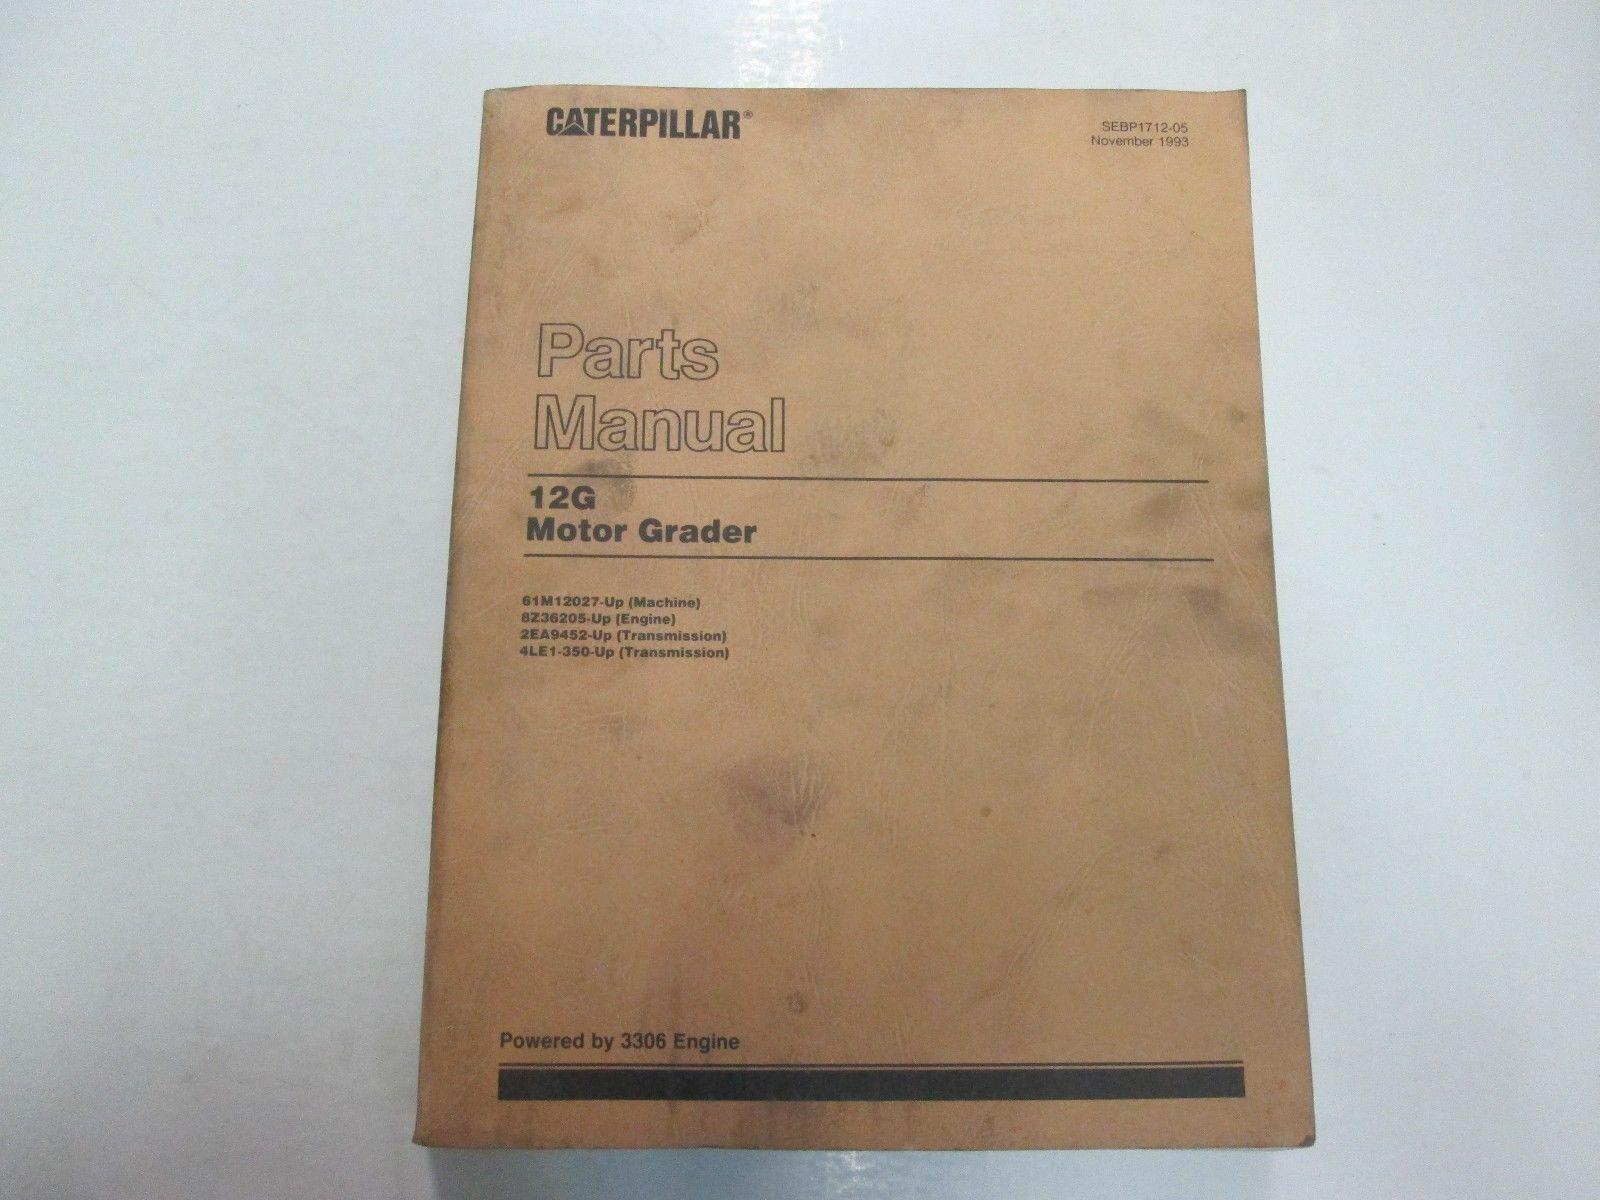 Farmhand xl 940 loader parts manual ebook array sharp spc315 manual ebook rh sharp spc315 manual ebook youmustlearn us fandeluxe Choice Image